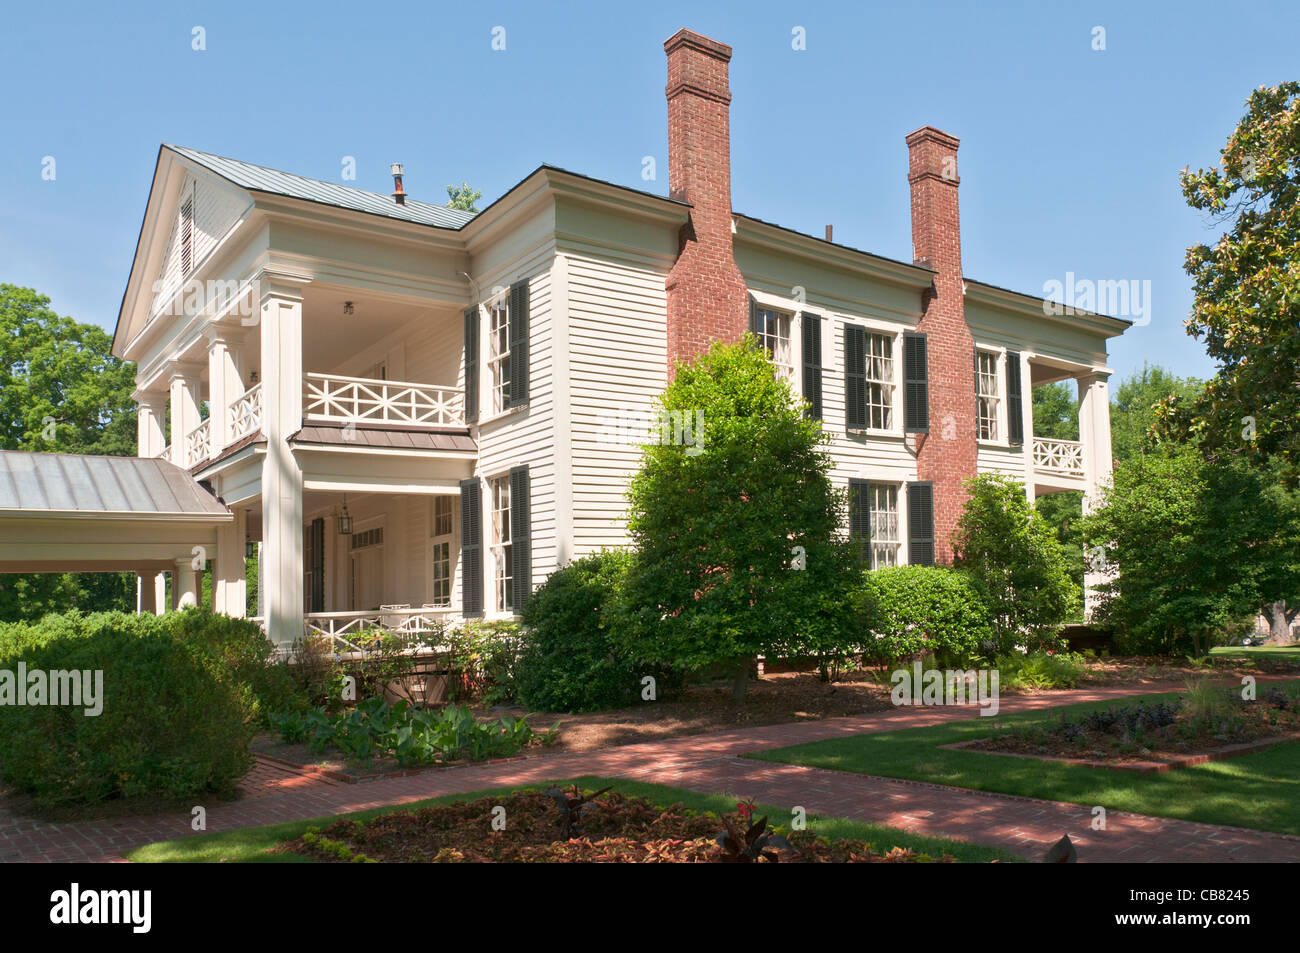 Alabama Birmingham Arlington Antebellum Home And Gardens Stock Photo Royalty Free Image